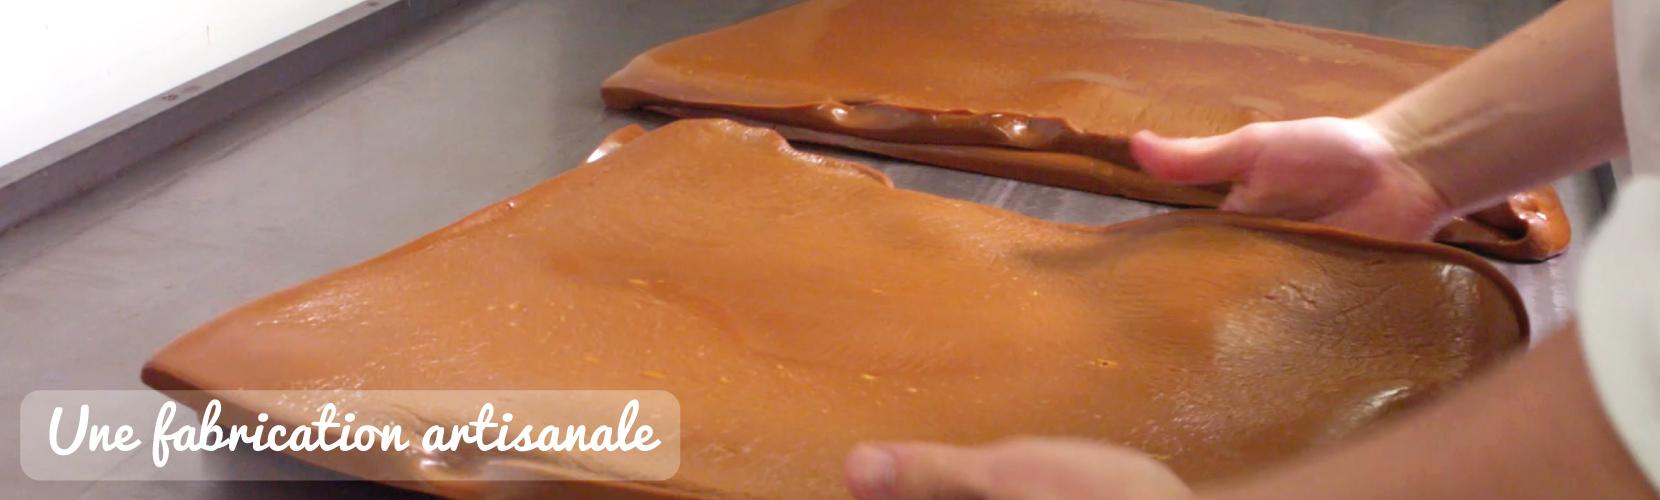 fabrication artisanale caramel